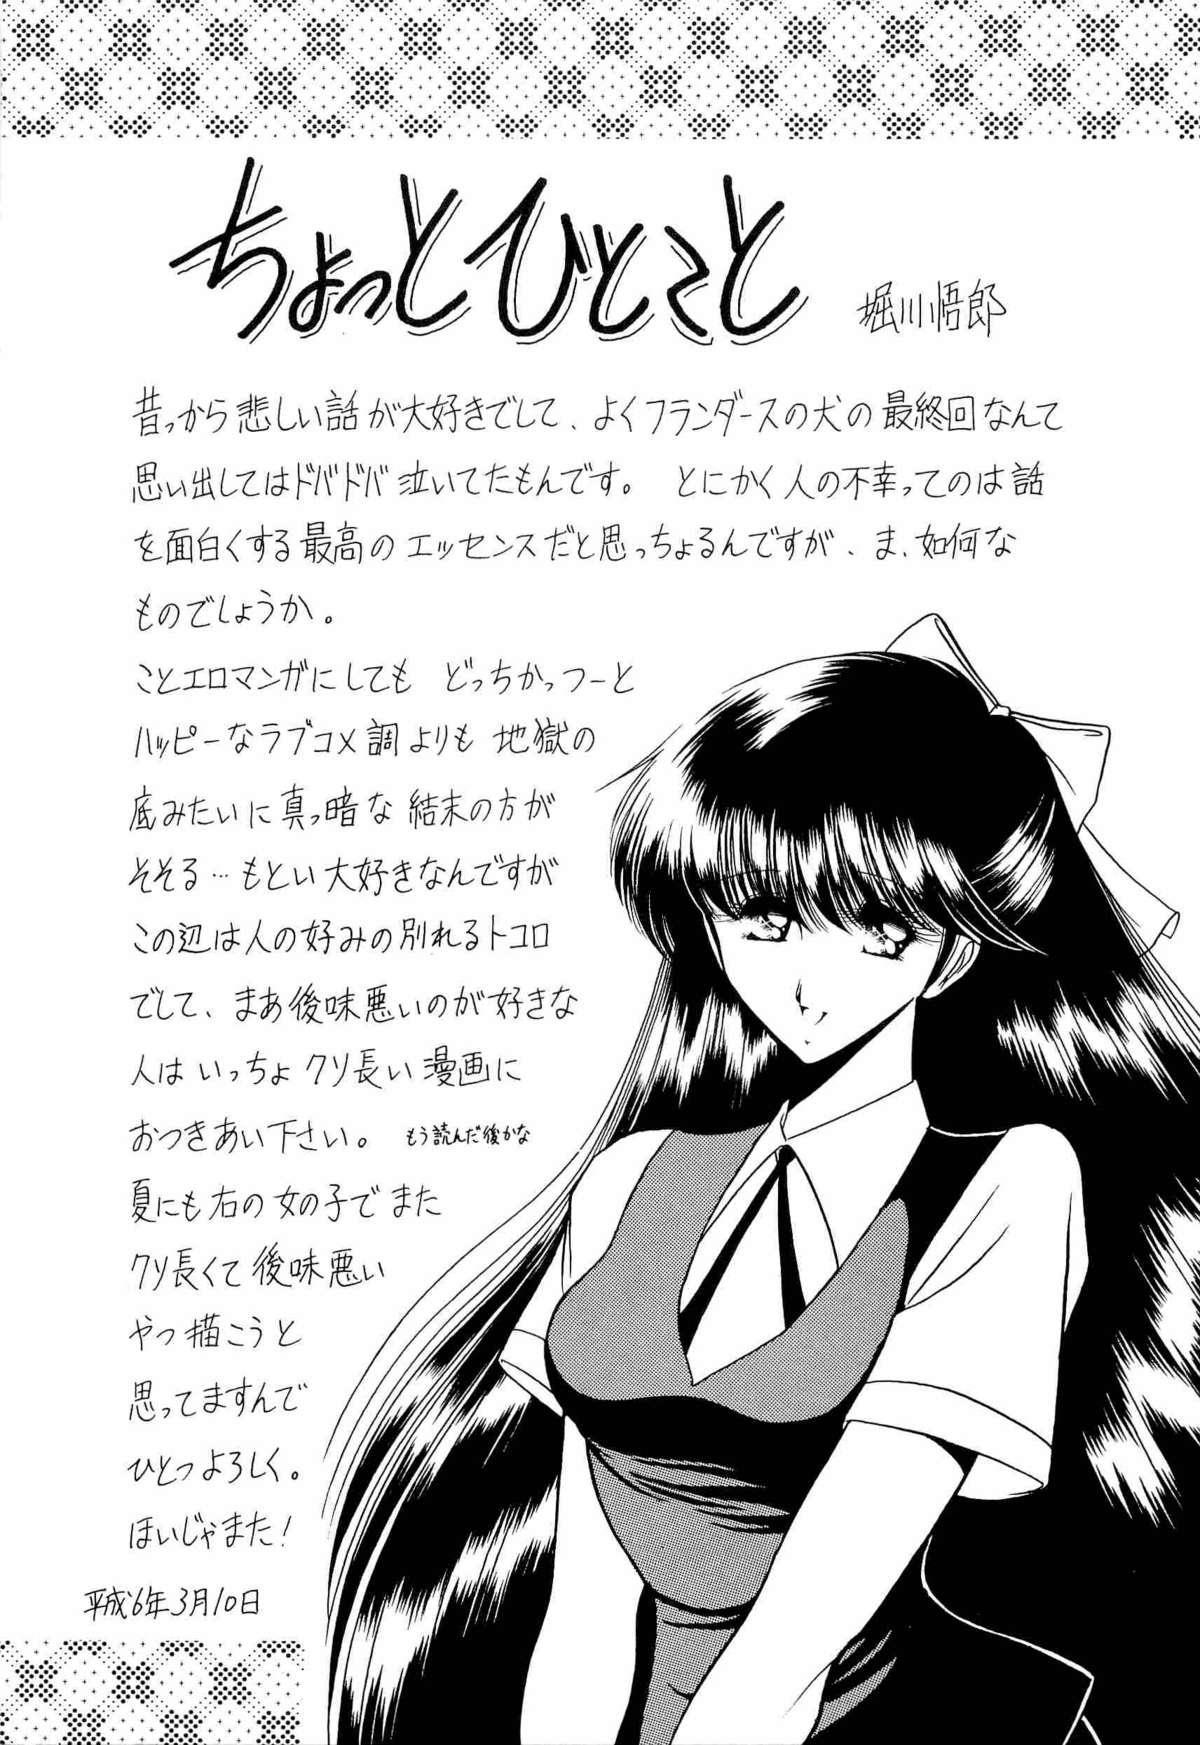 Bisyoujo Anthology '93 jyoukan 119